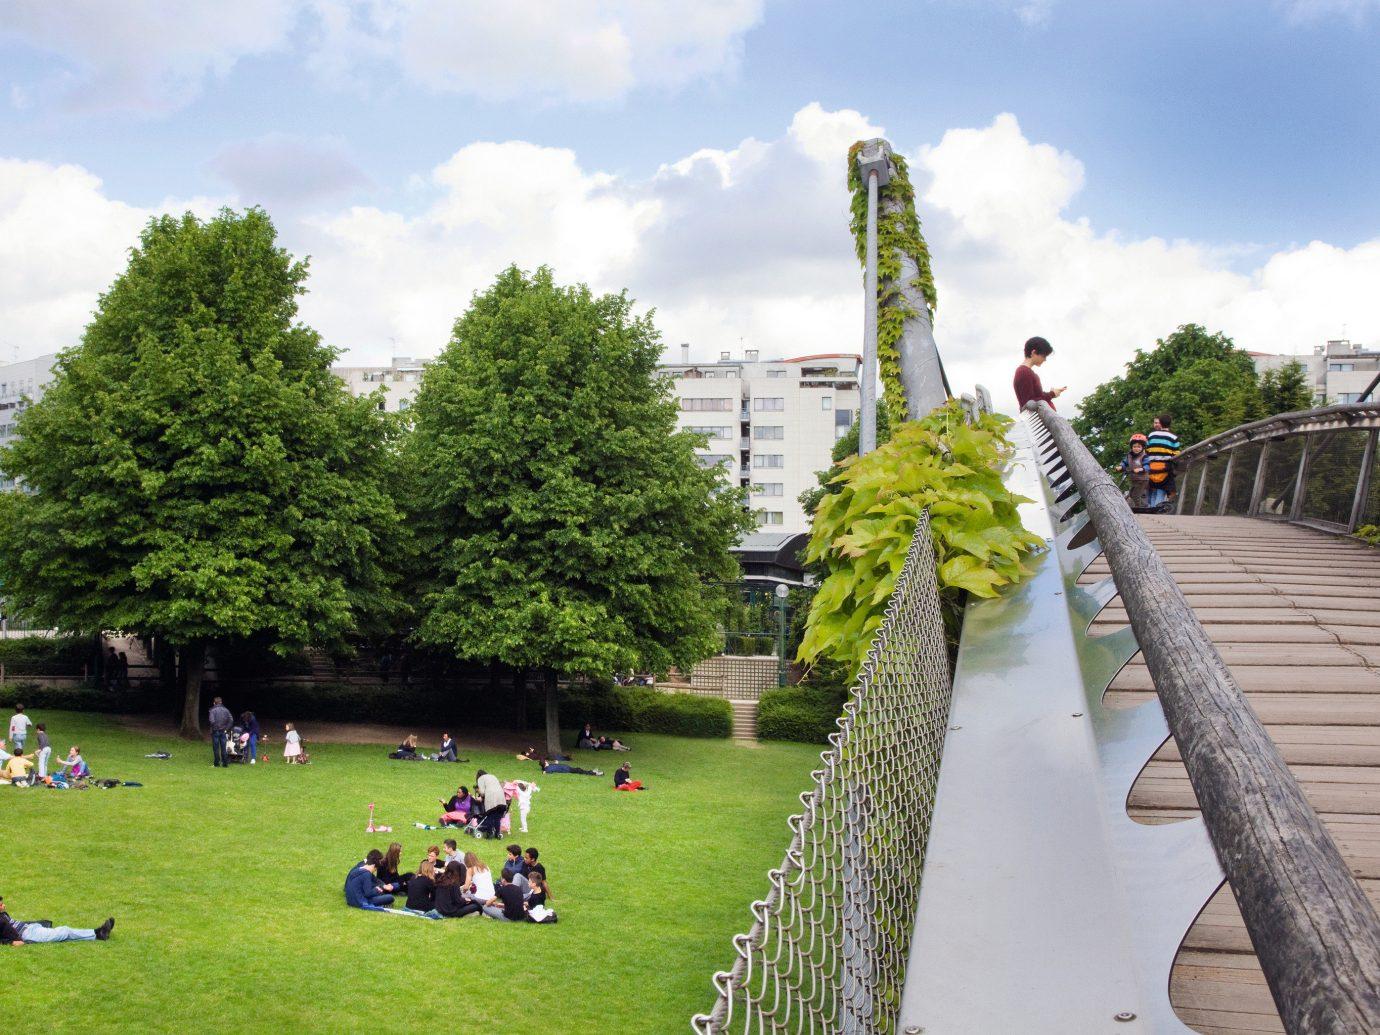 Romance Trip Ideas sky outdoor tree grass plant park flower Garden waterway day